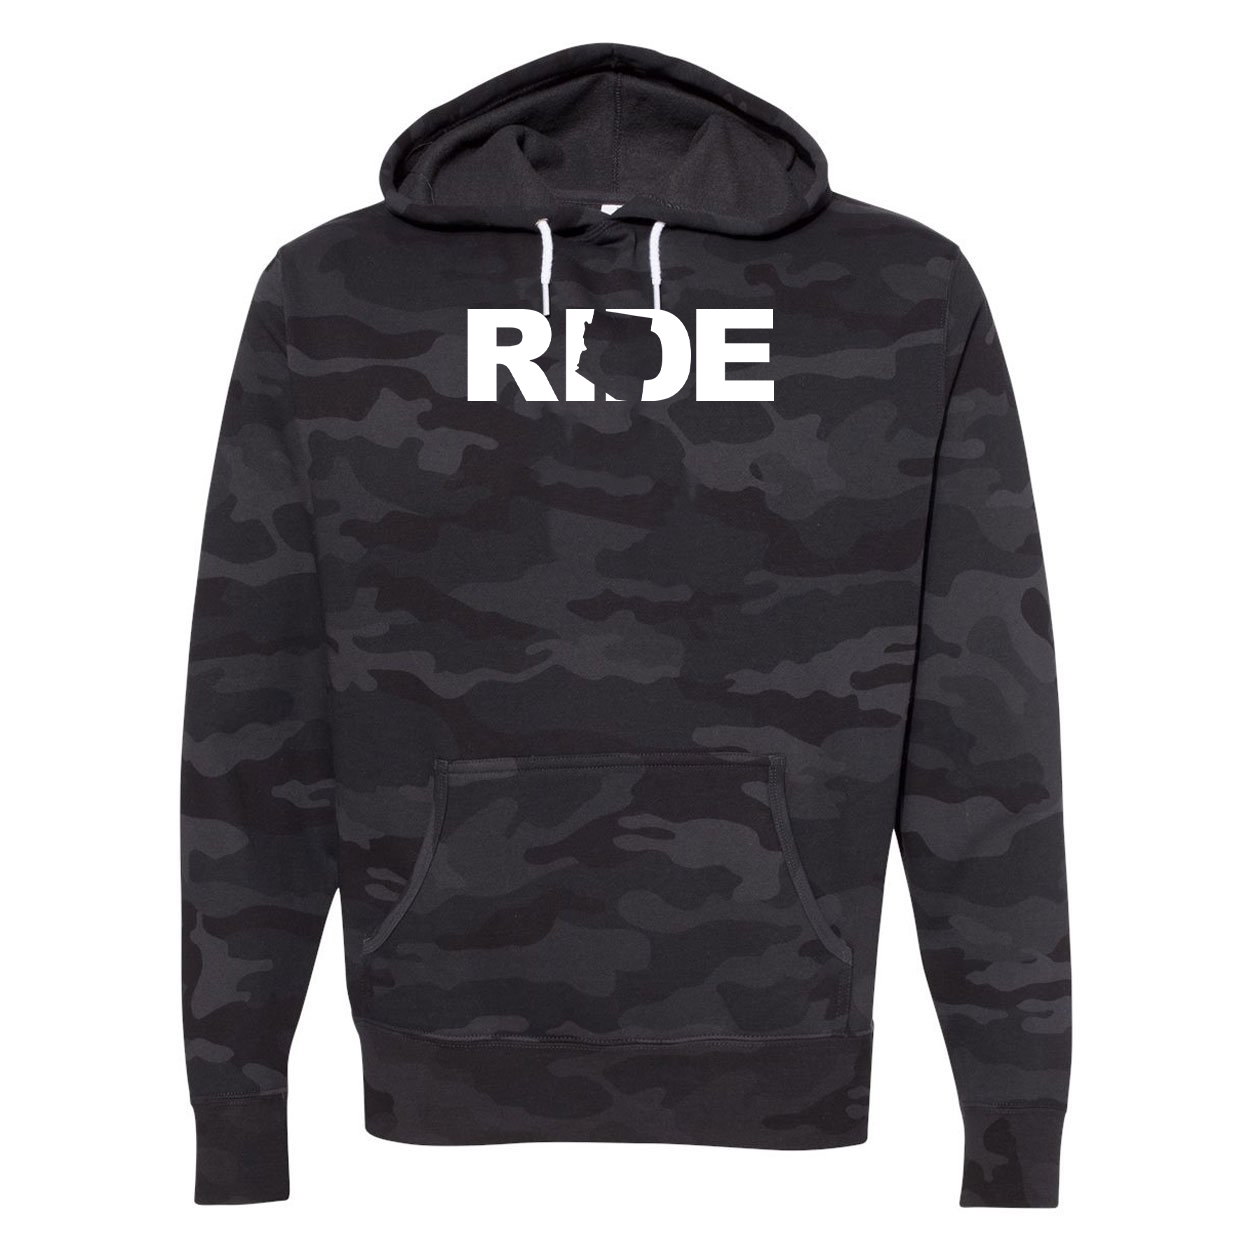 Ride Arizona Classic Unisex Hooded Sweatshirt Black Camo (White Logo)